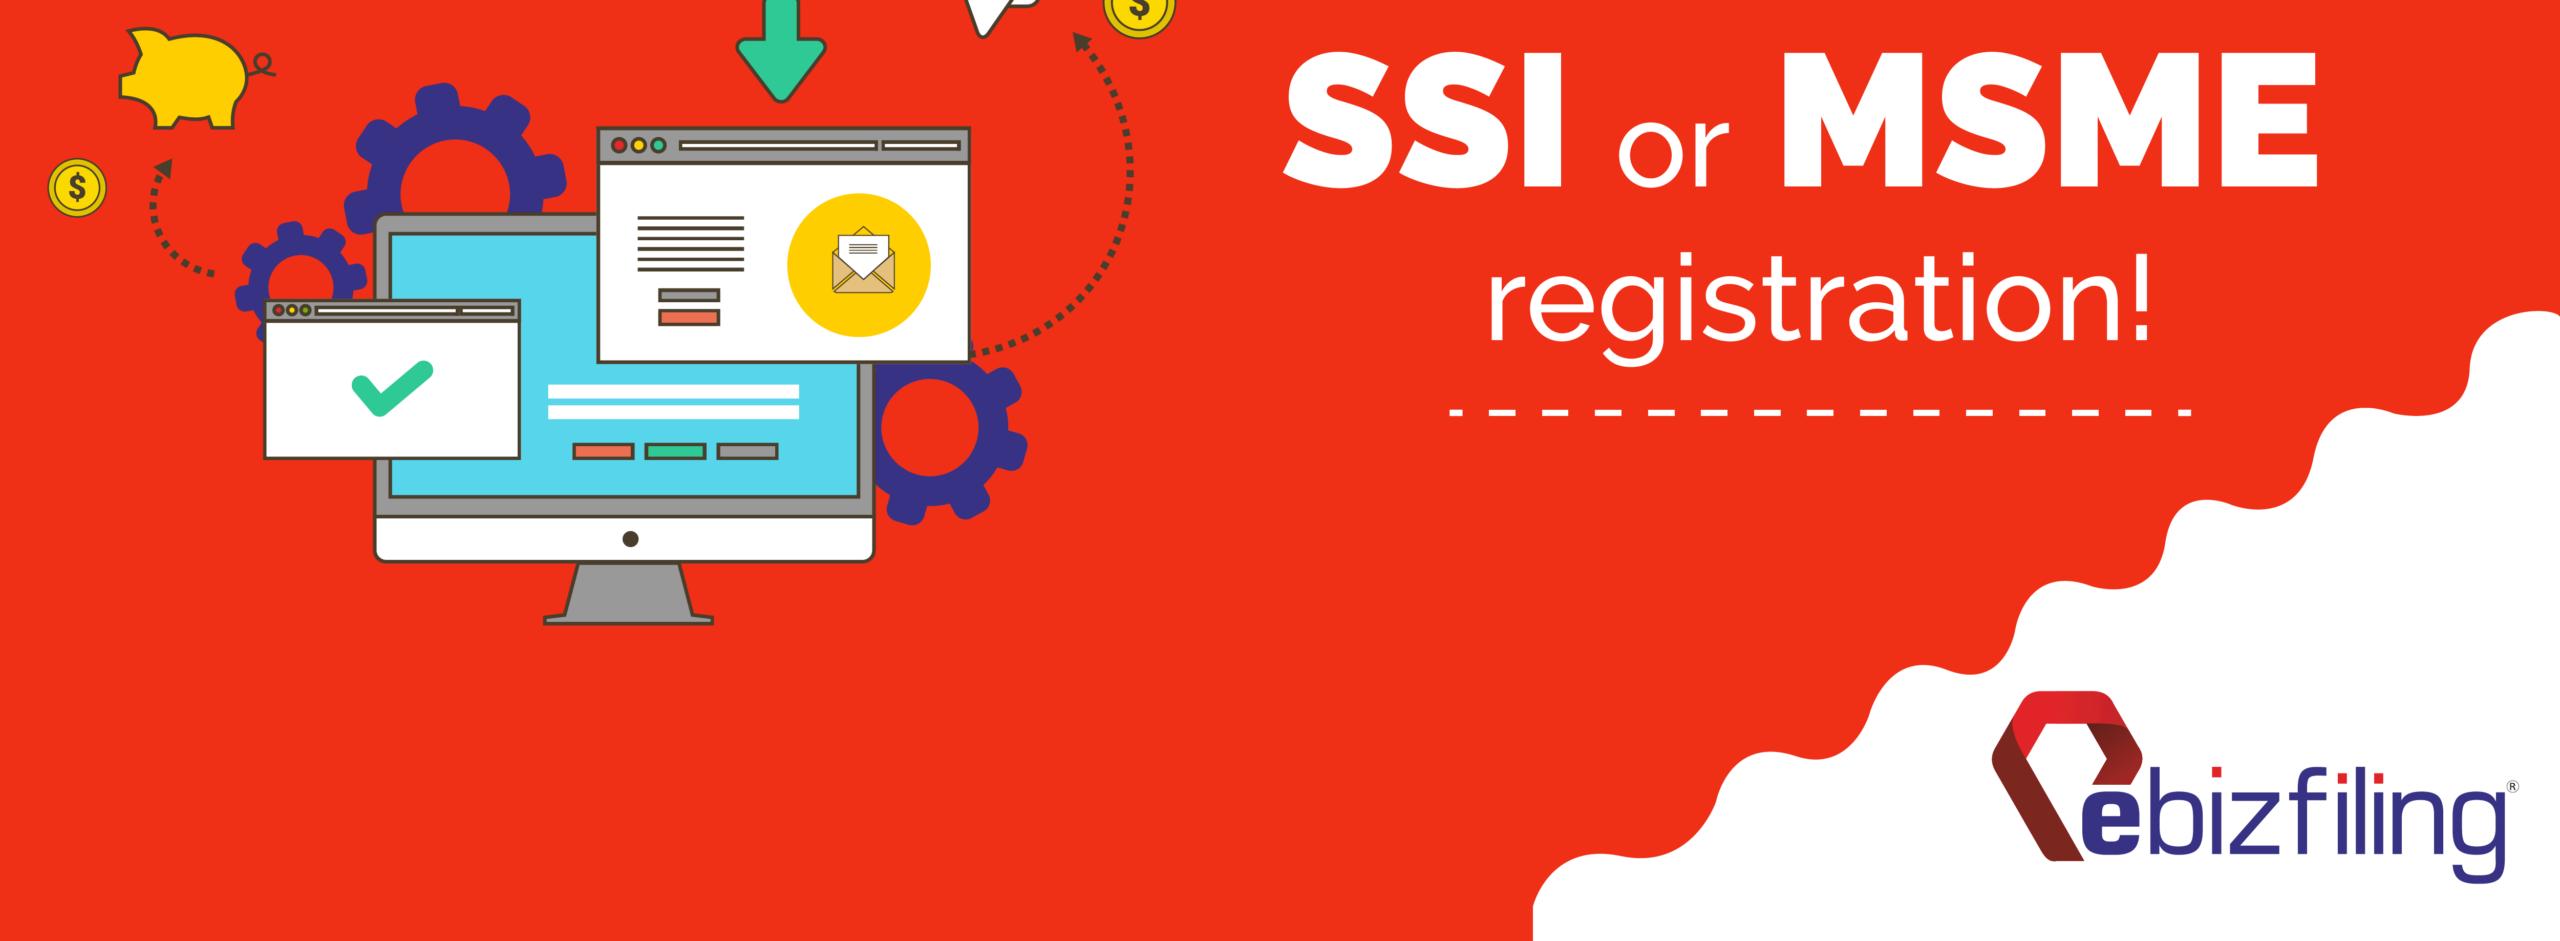 MSMe registration process, MSME, MSMe criteria, Ebifiling